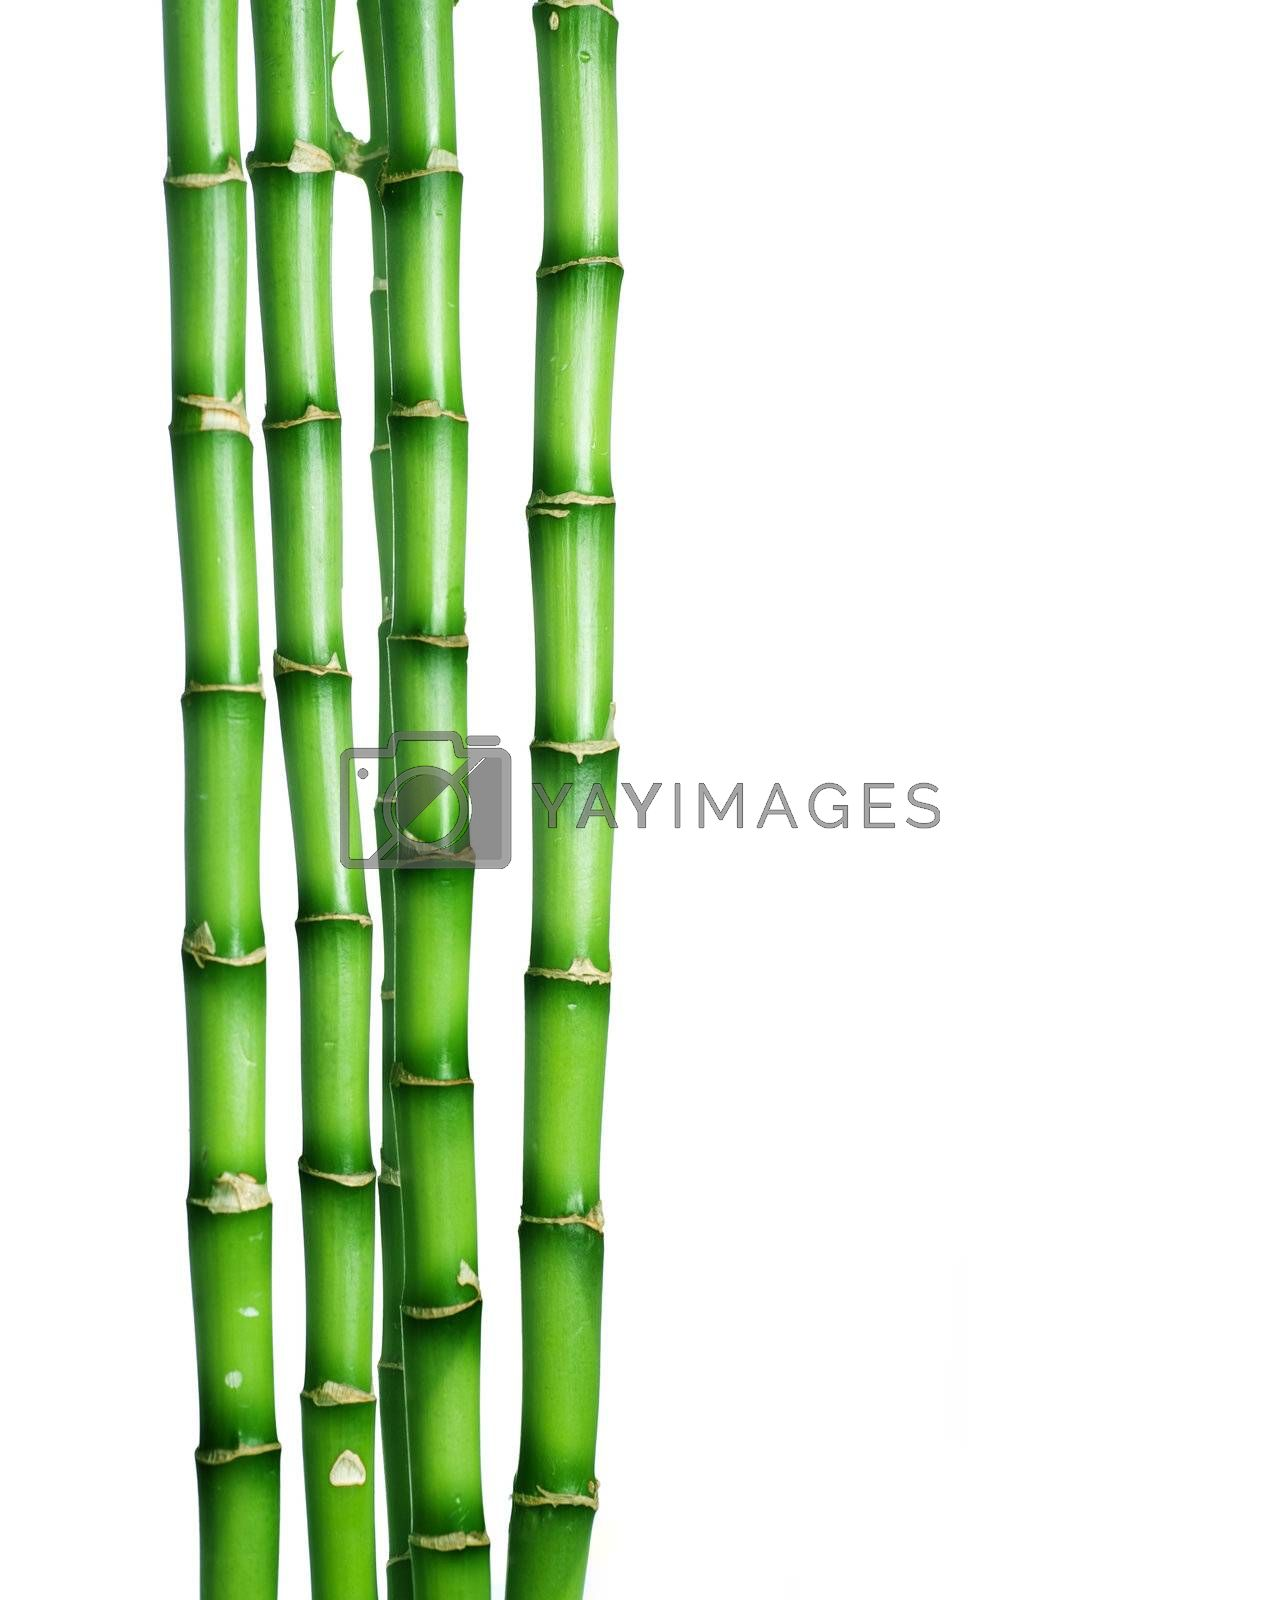 Bamboo over white  by Subbotina Anna